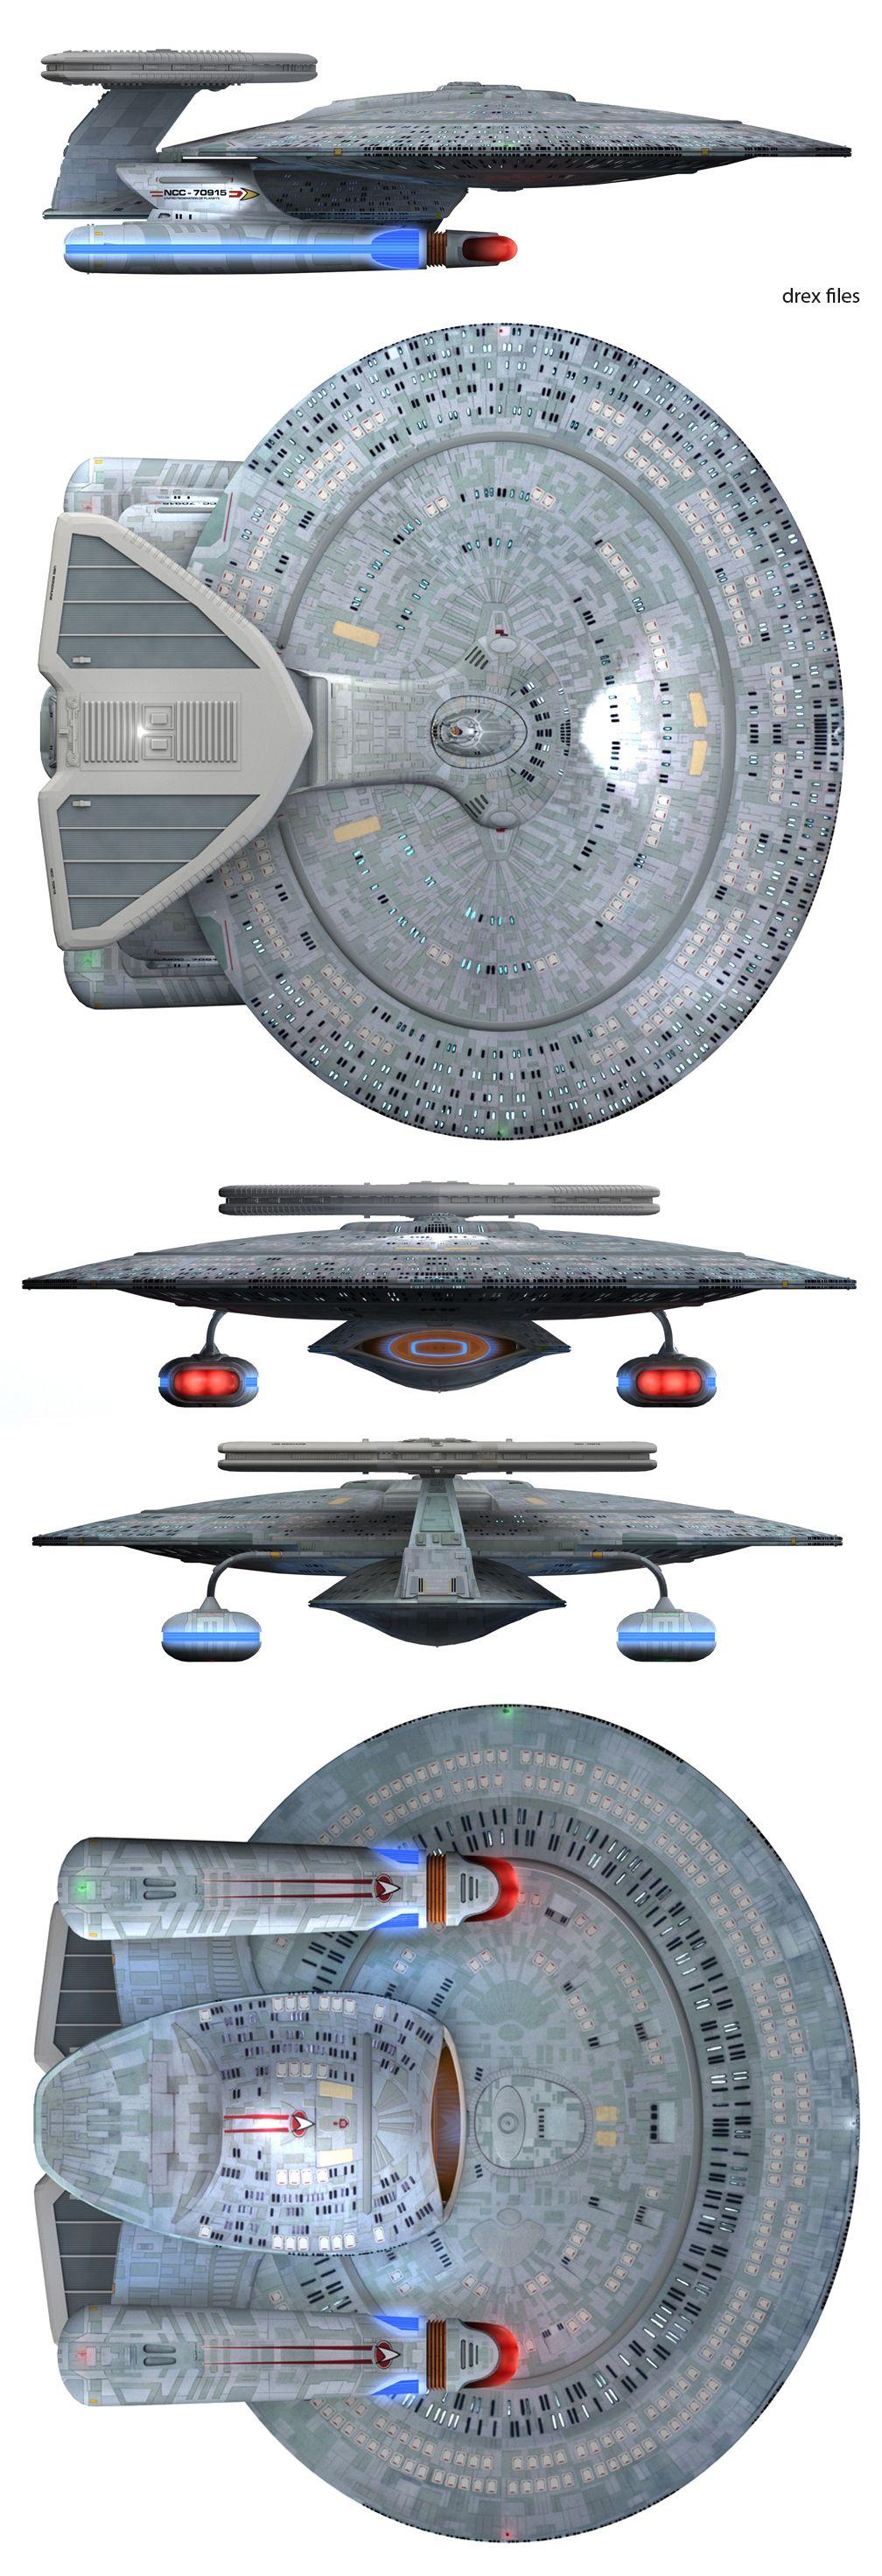 pin federation starfleet class - photo #21